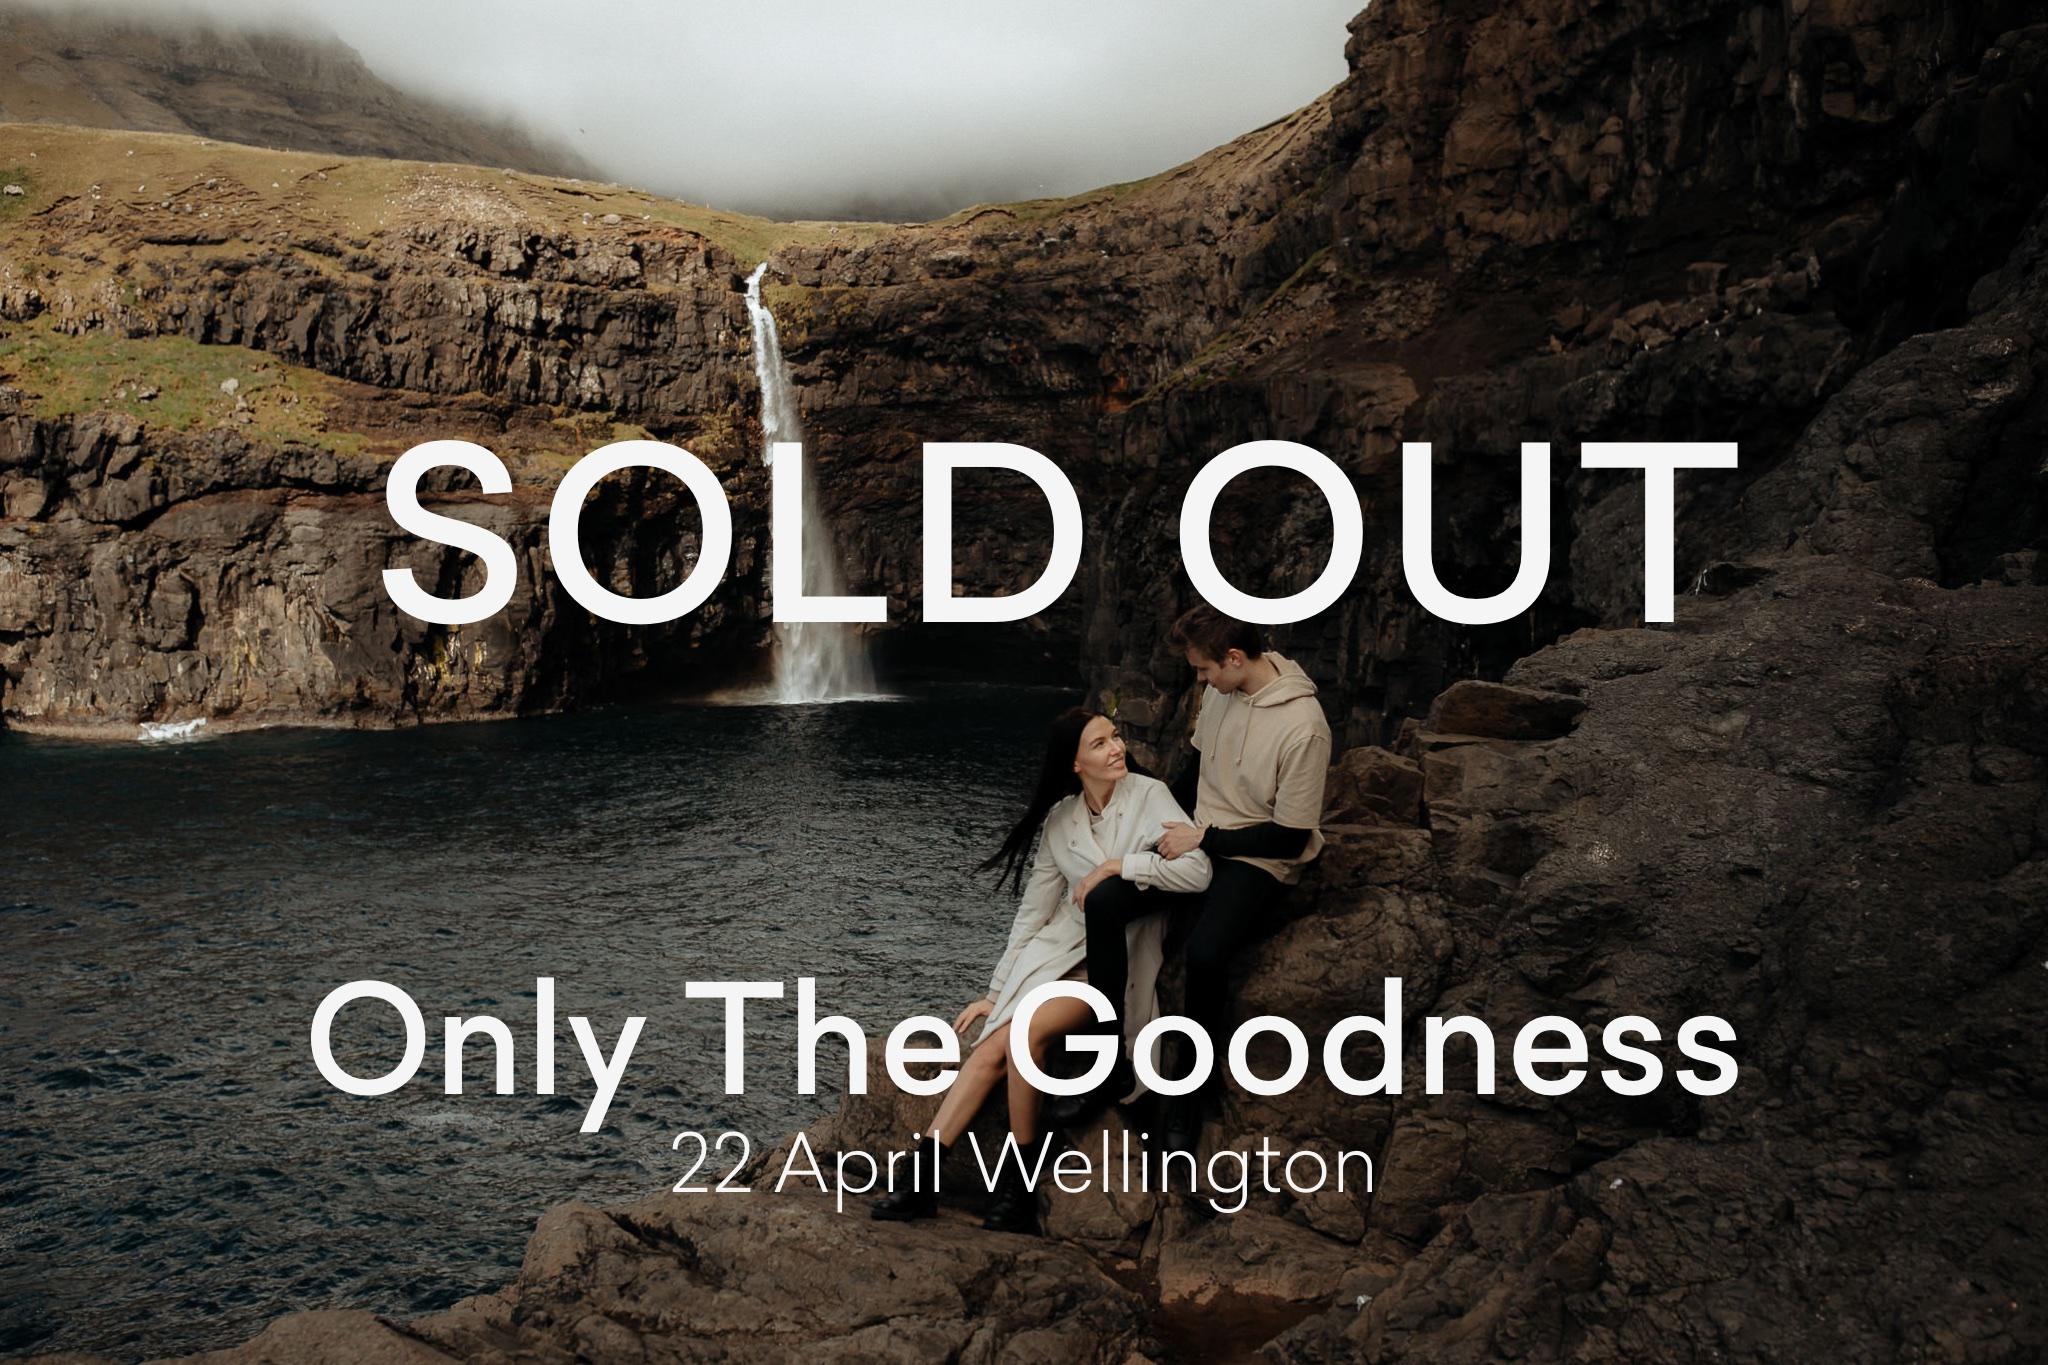 22 April 2018 Wellington